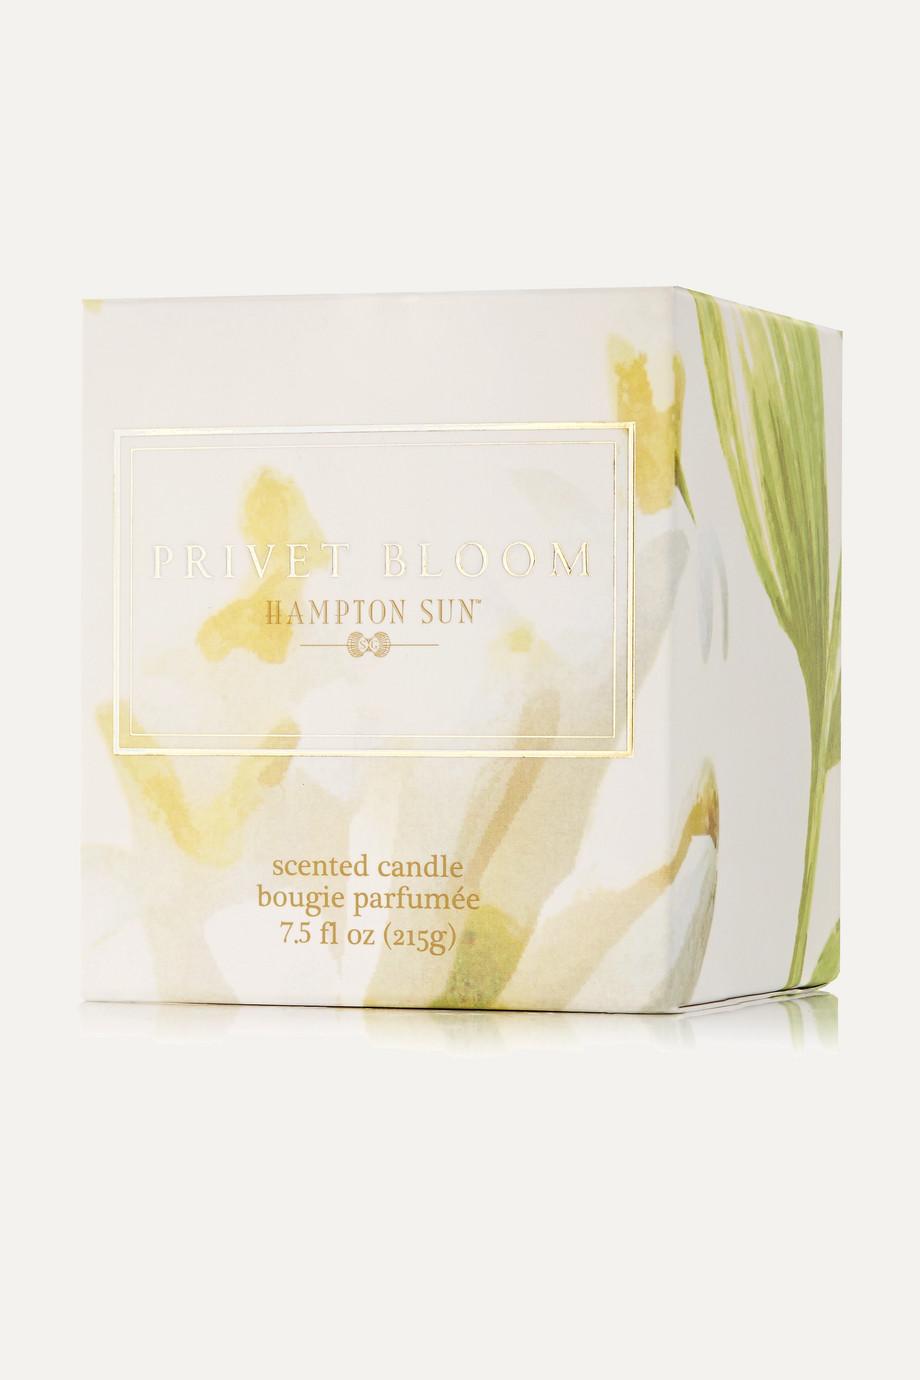 Hampton Sun Privet Bloom Scented Candle, 215g